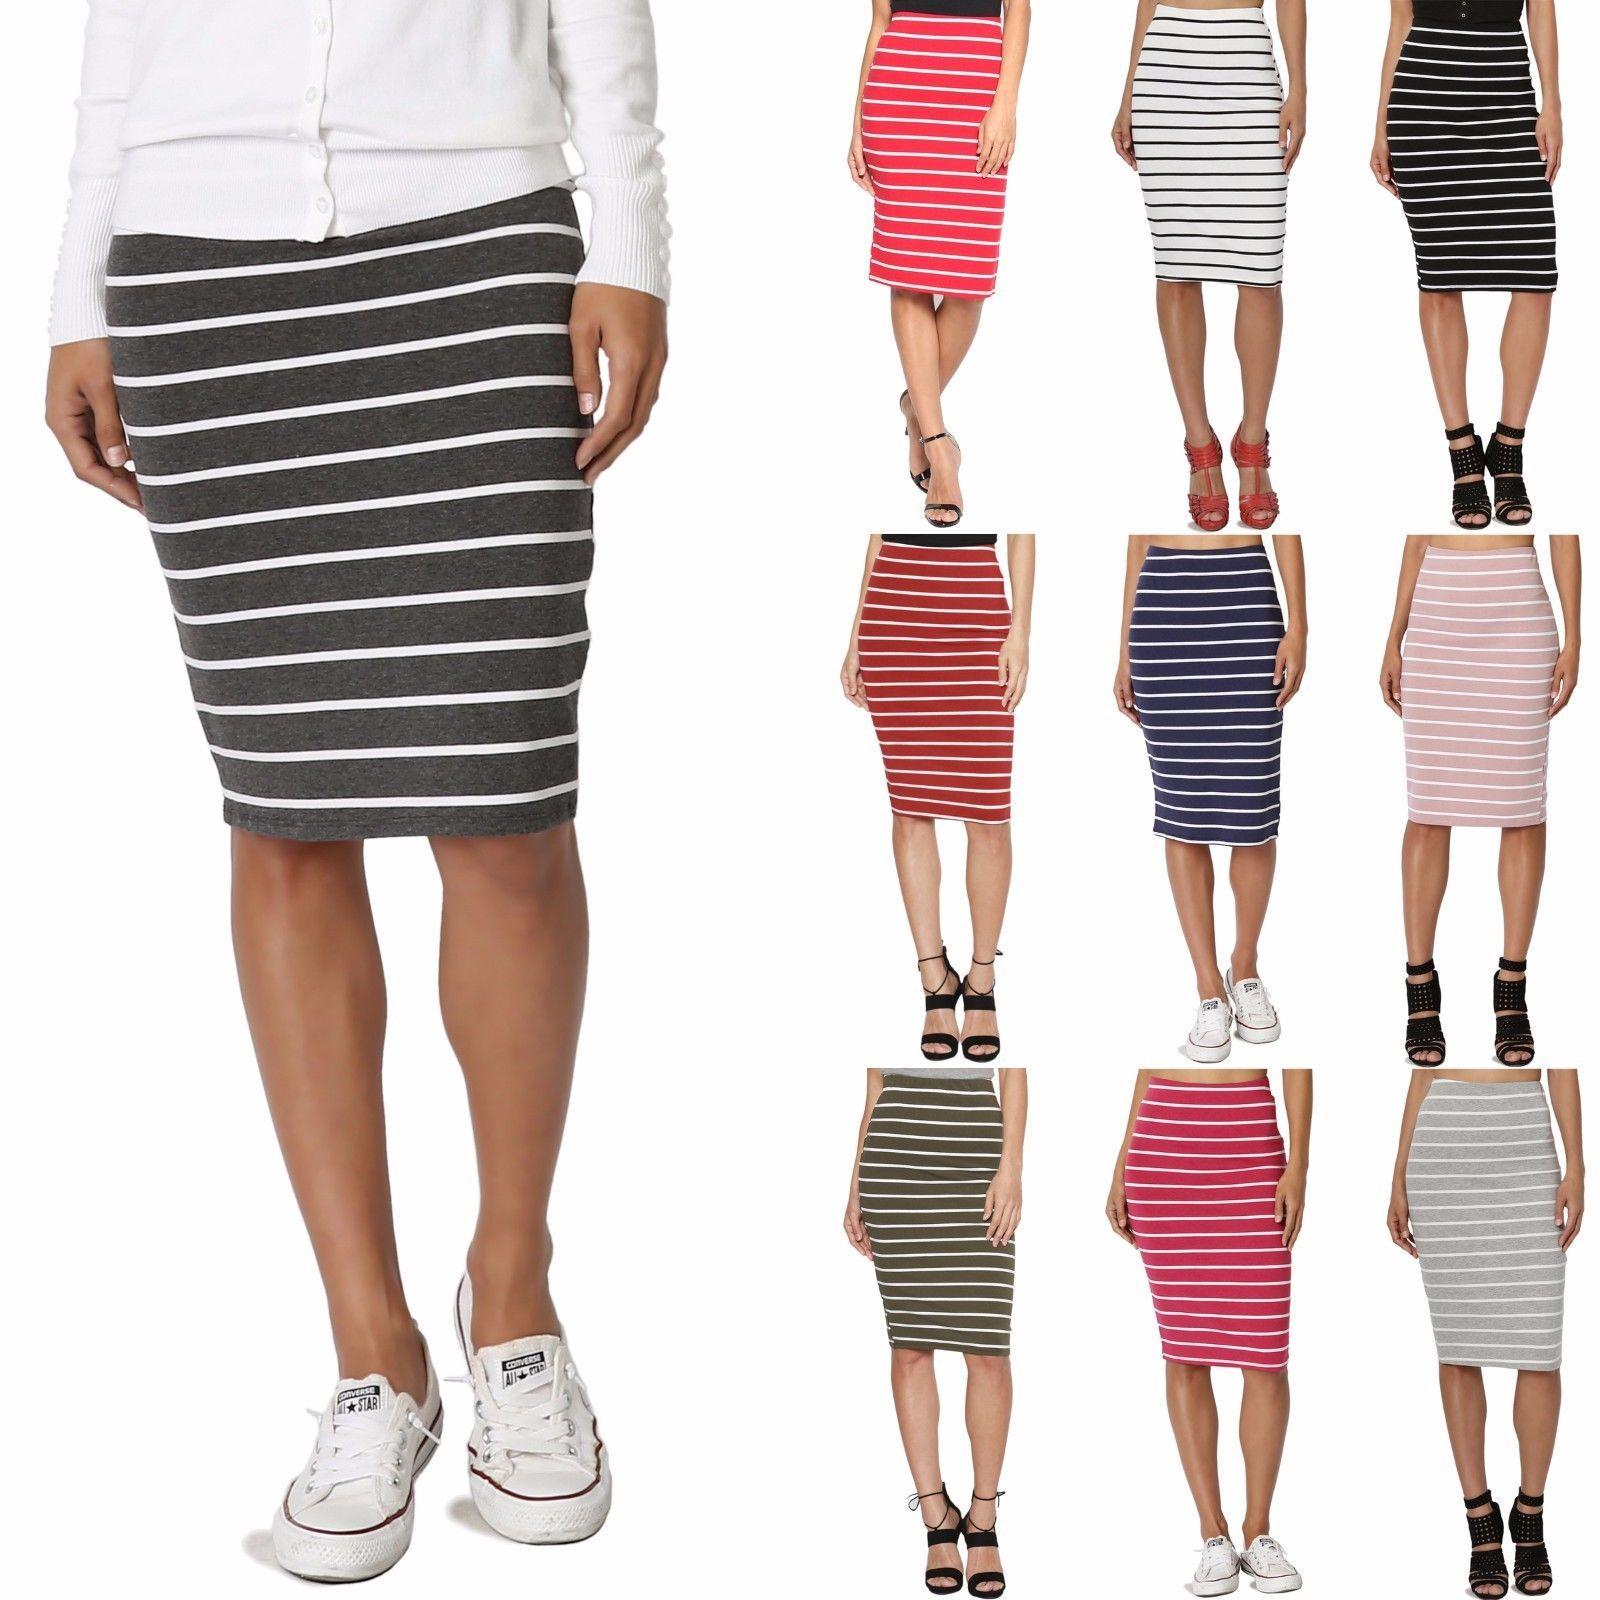 39a1ff3e95d41 Themogan Women s Striped Stretch Cotton Elastic Waist Knee Length Pencil  Skirt